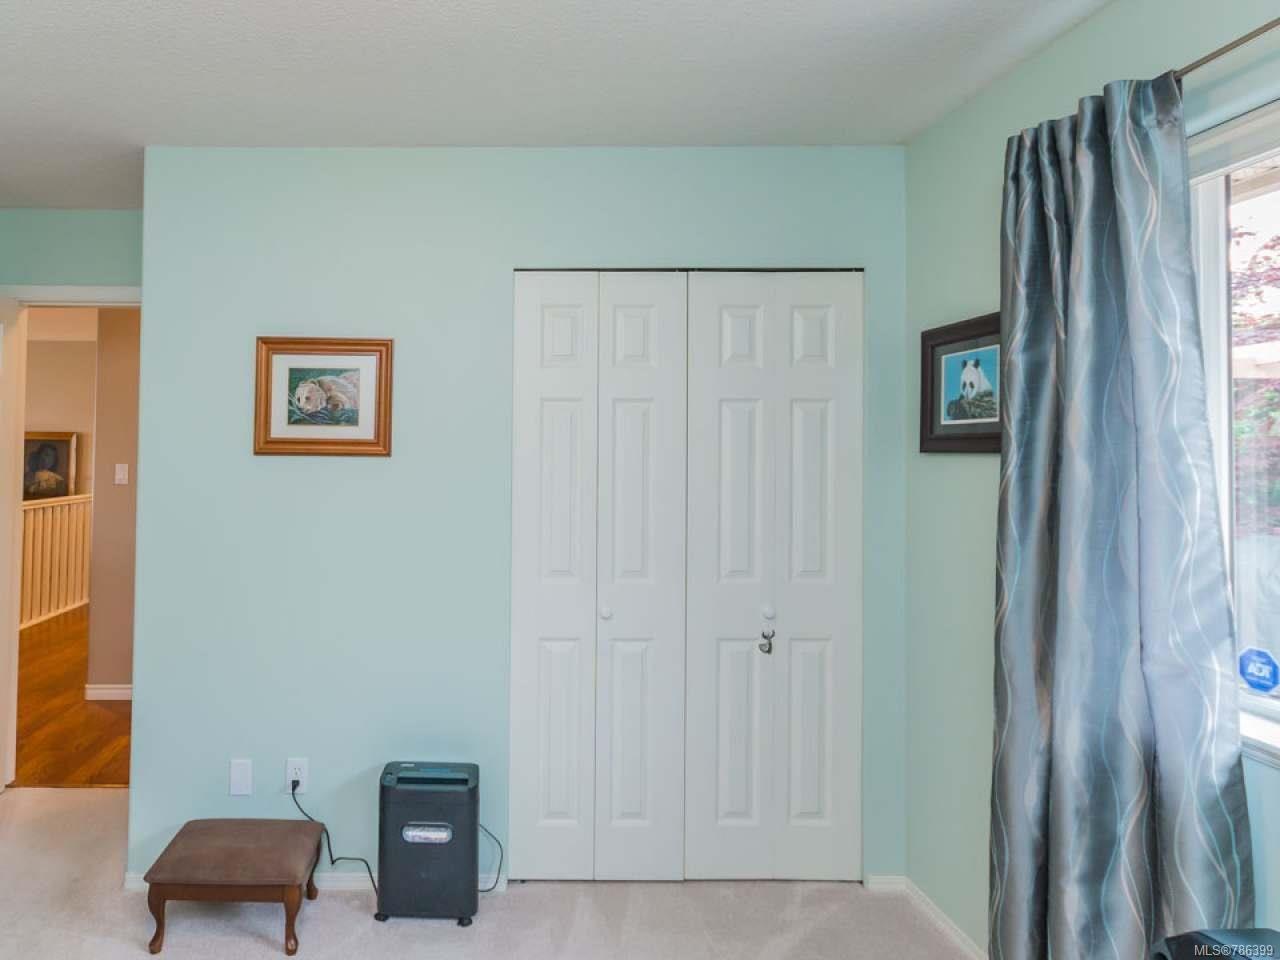 Photo 26: Photos: 5371 HIGHRIDGE PLACE in NANAIMO: Na North Nanaimo House for sale (Nanaimo)  : MLS®# 786399